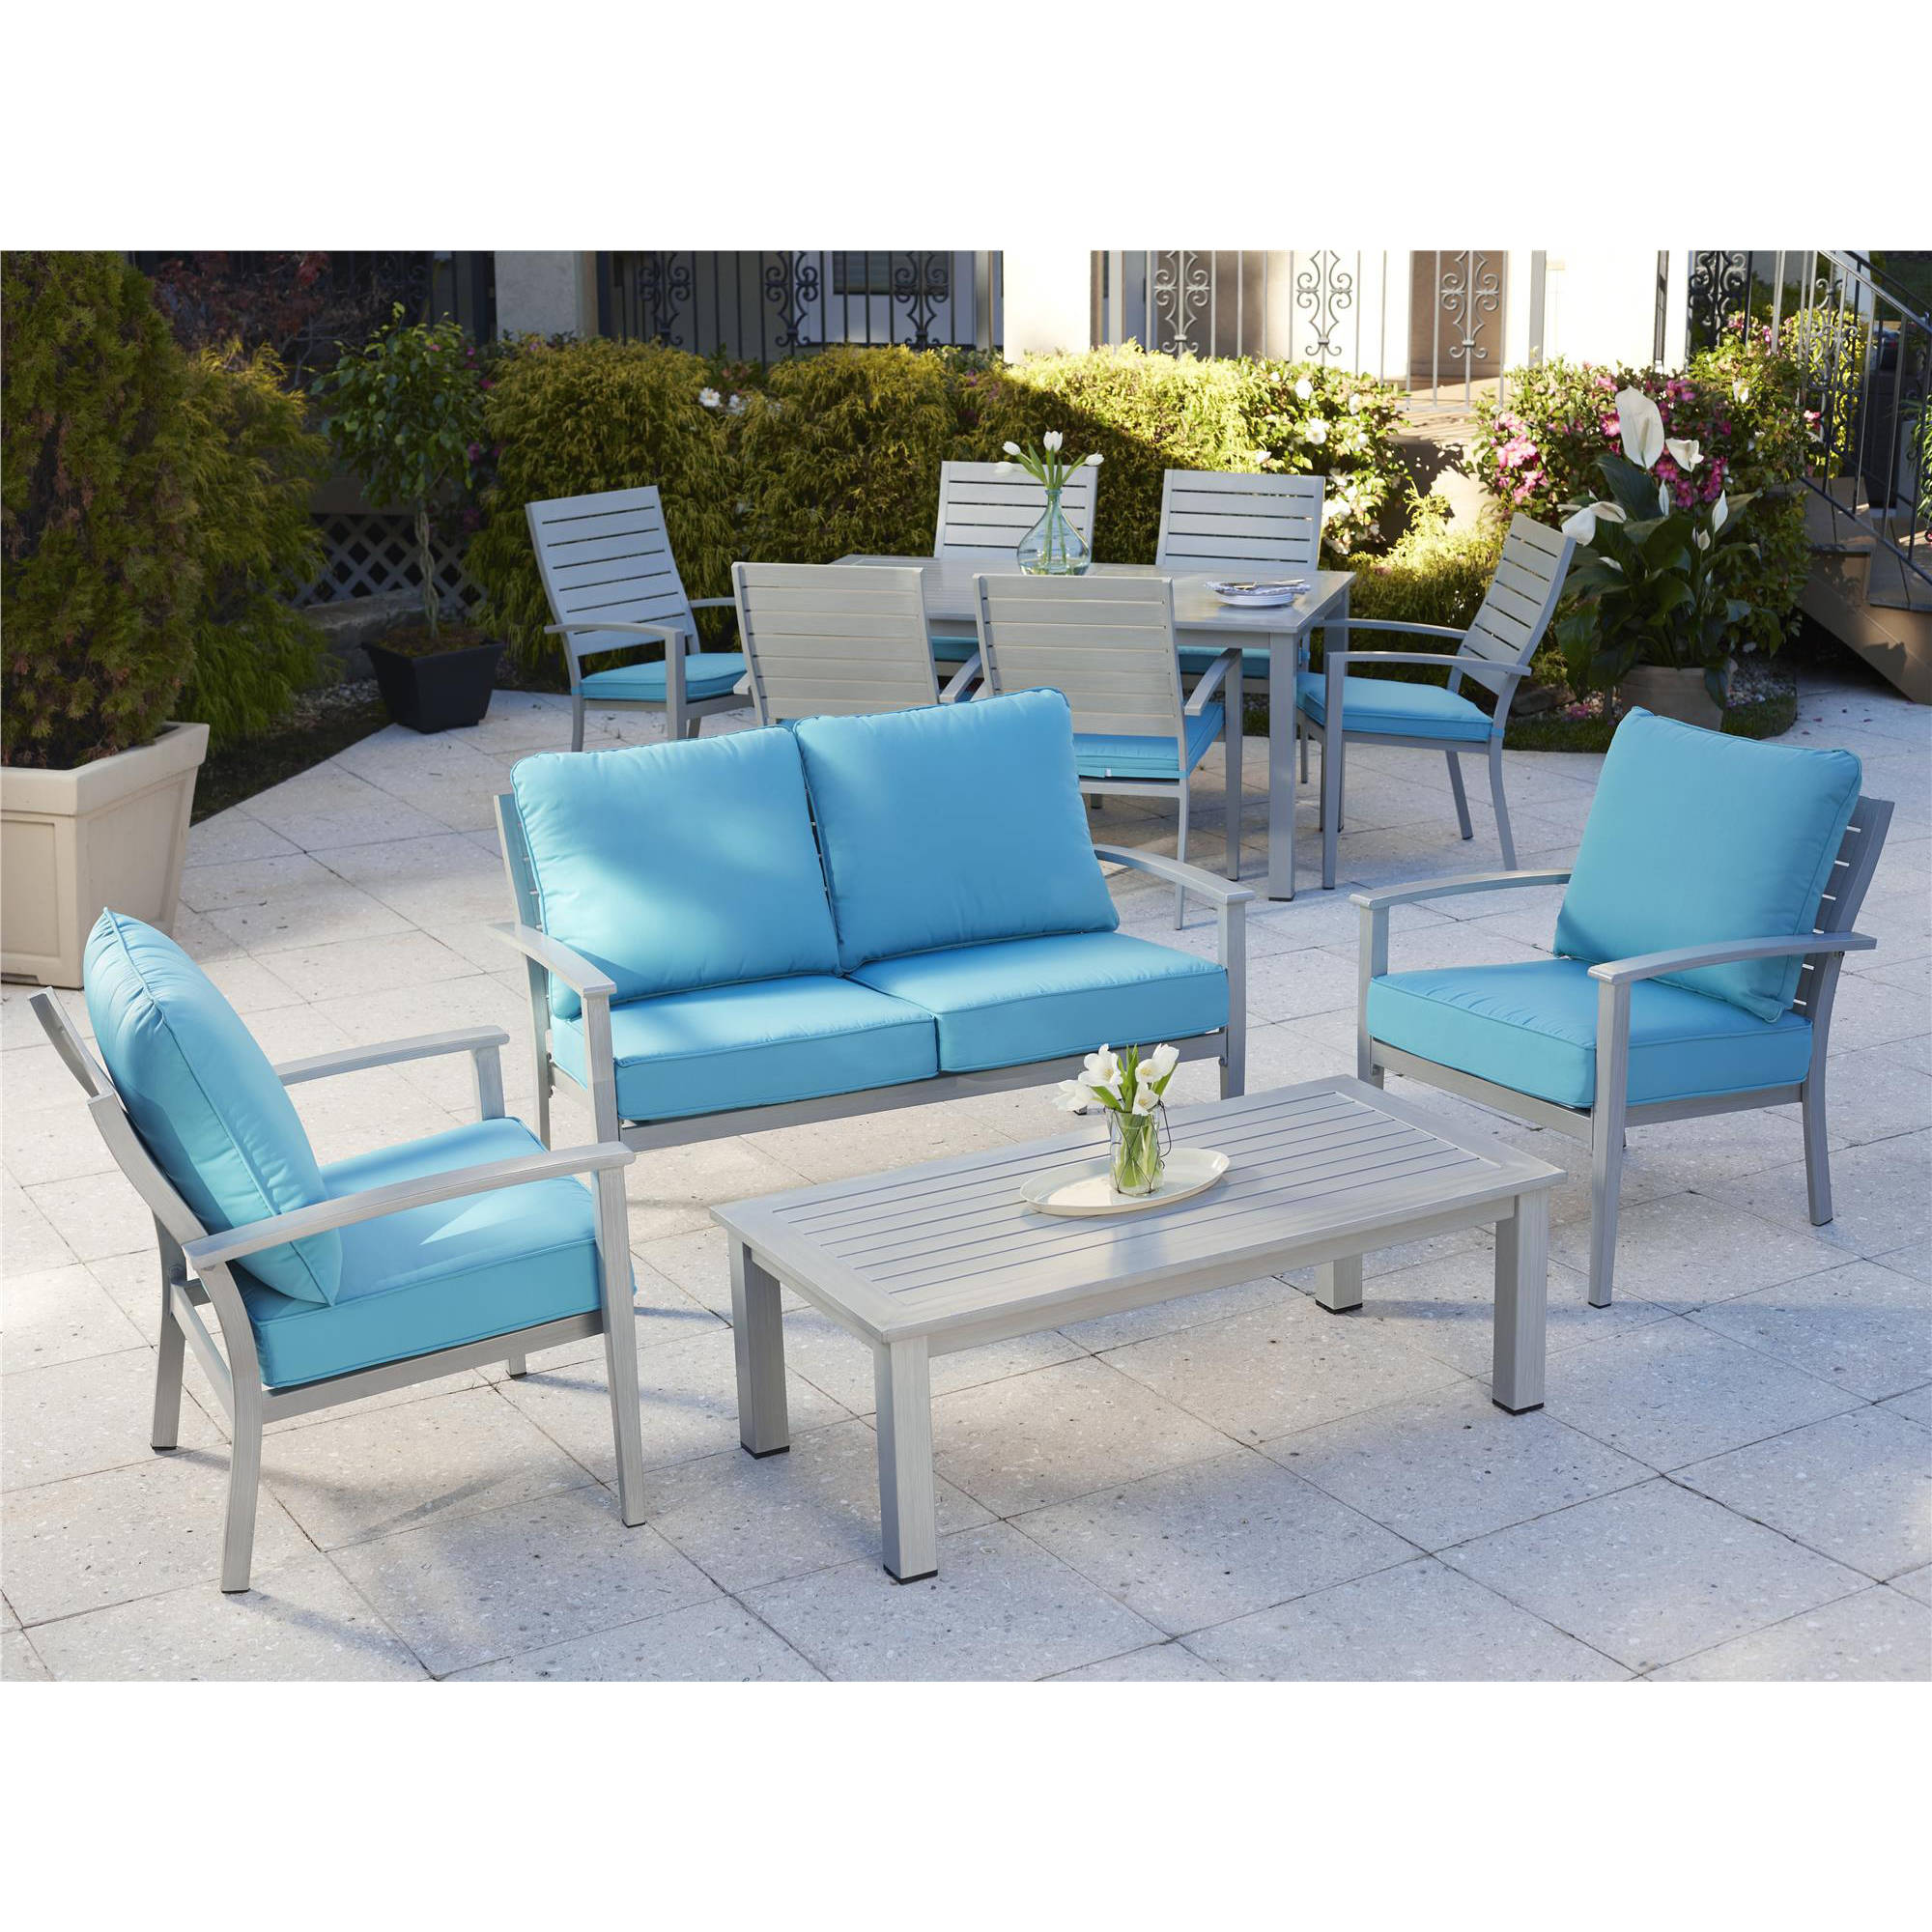 Cosco Outdoor Living Blue Veil 7 Piece Aluminum Dining Set